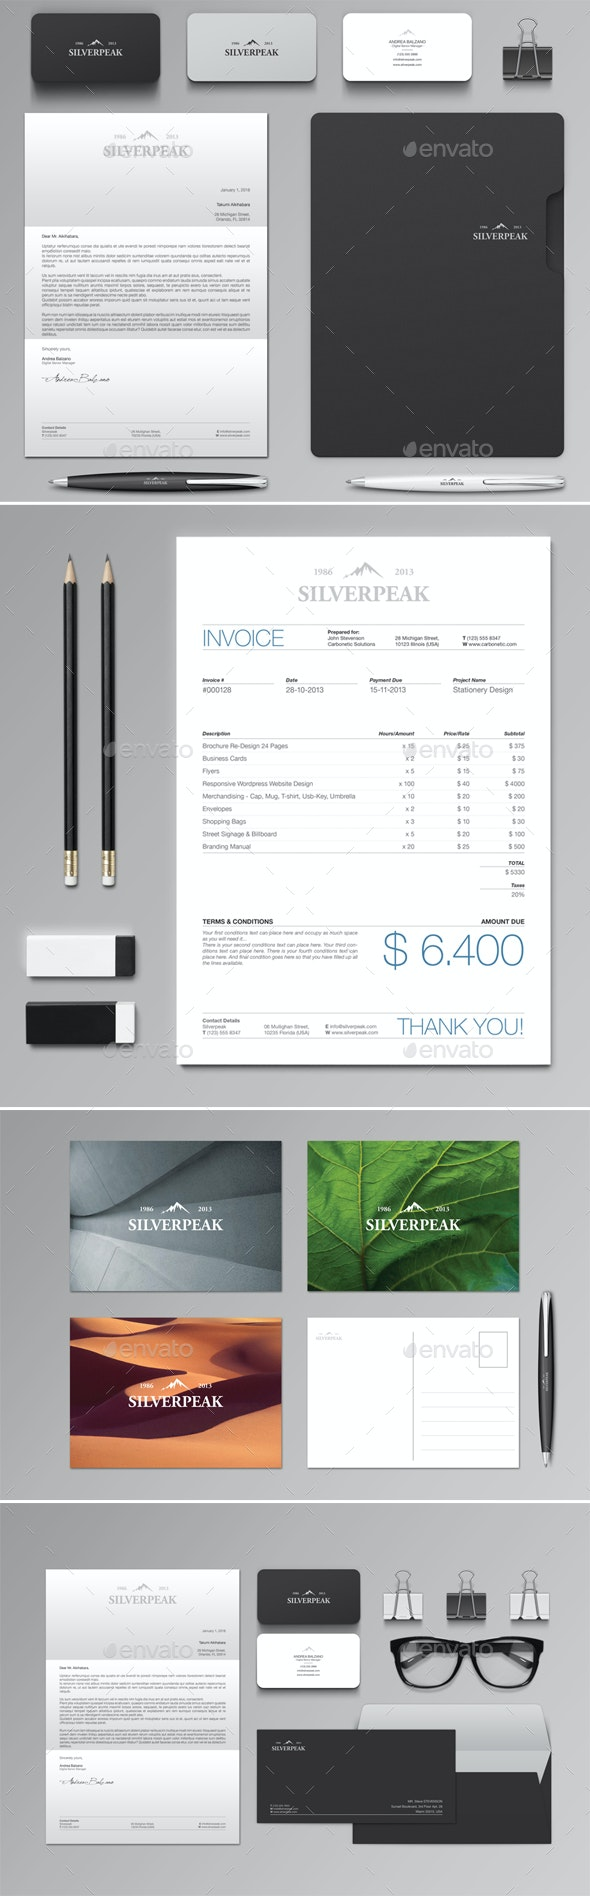 Silverpeak Stationery Set & Invoice Template - Stationery Print Templates